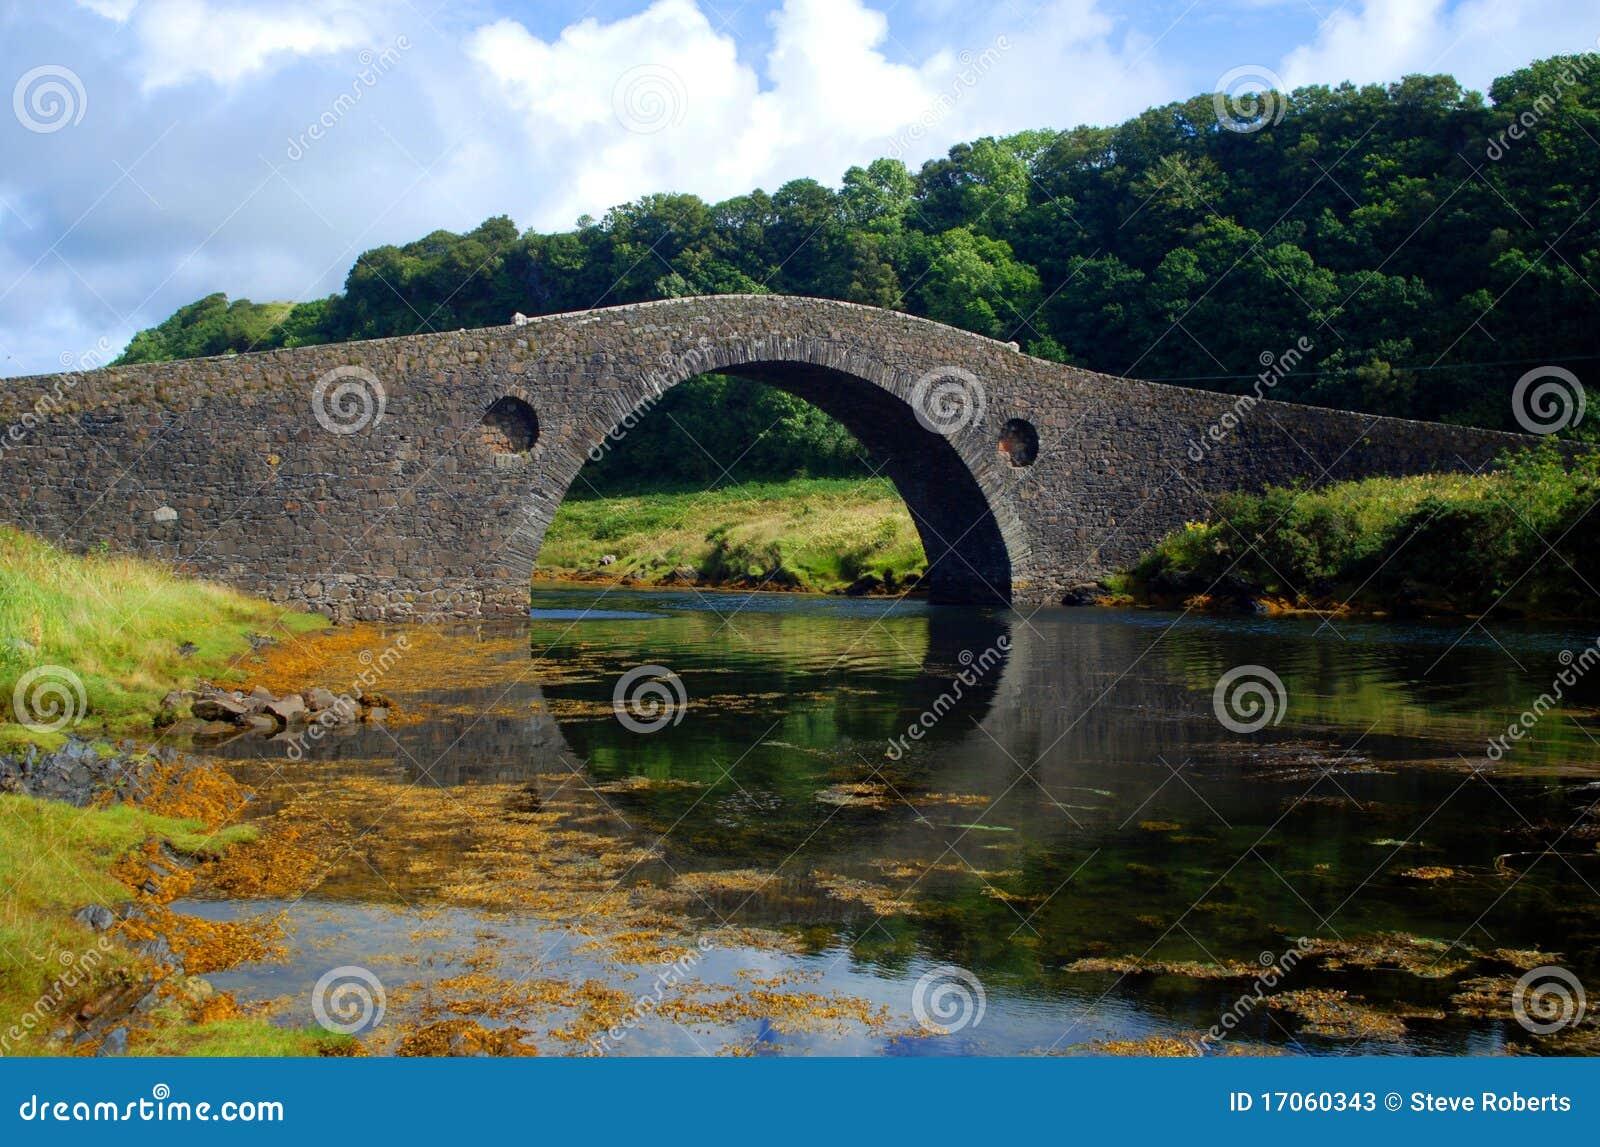 how to build an arch bridge